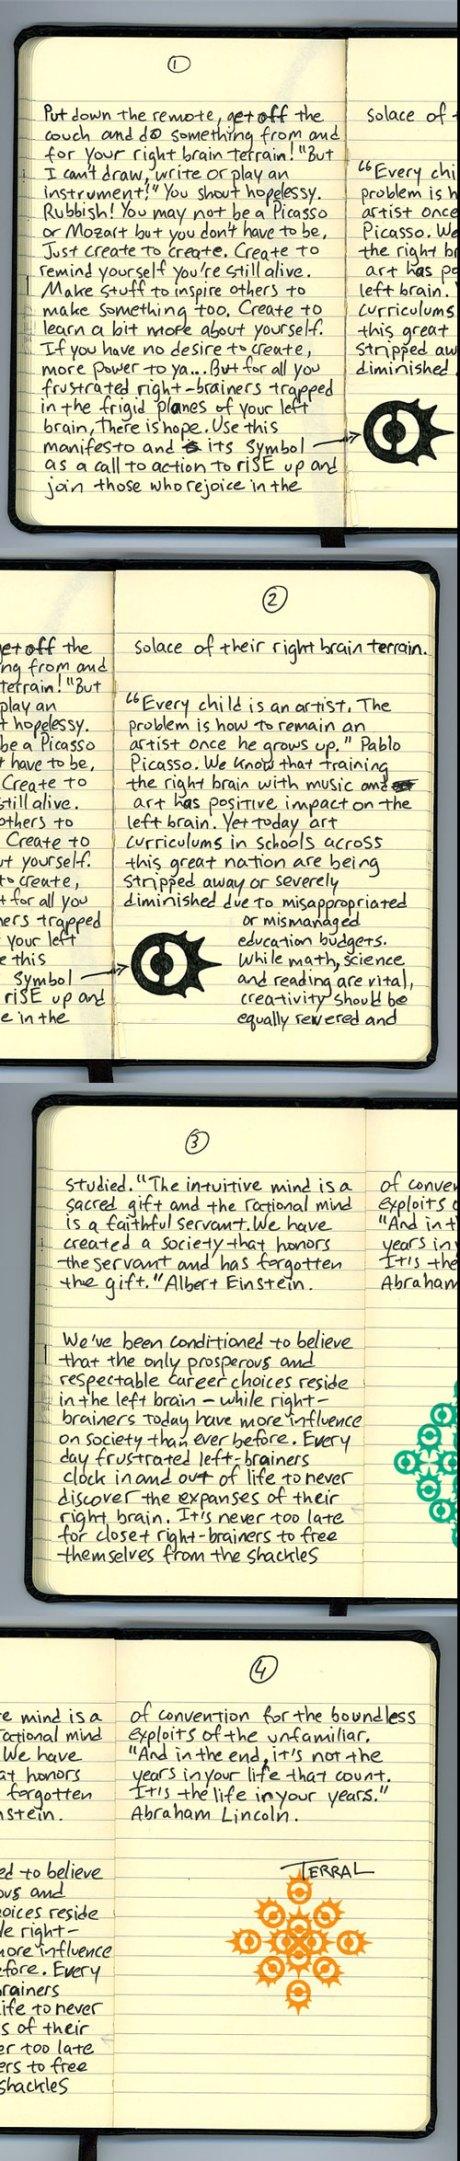 Terral_Manifesto